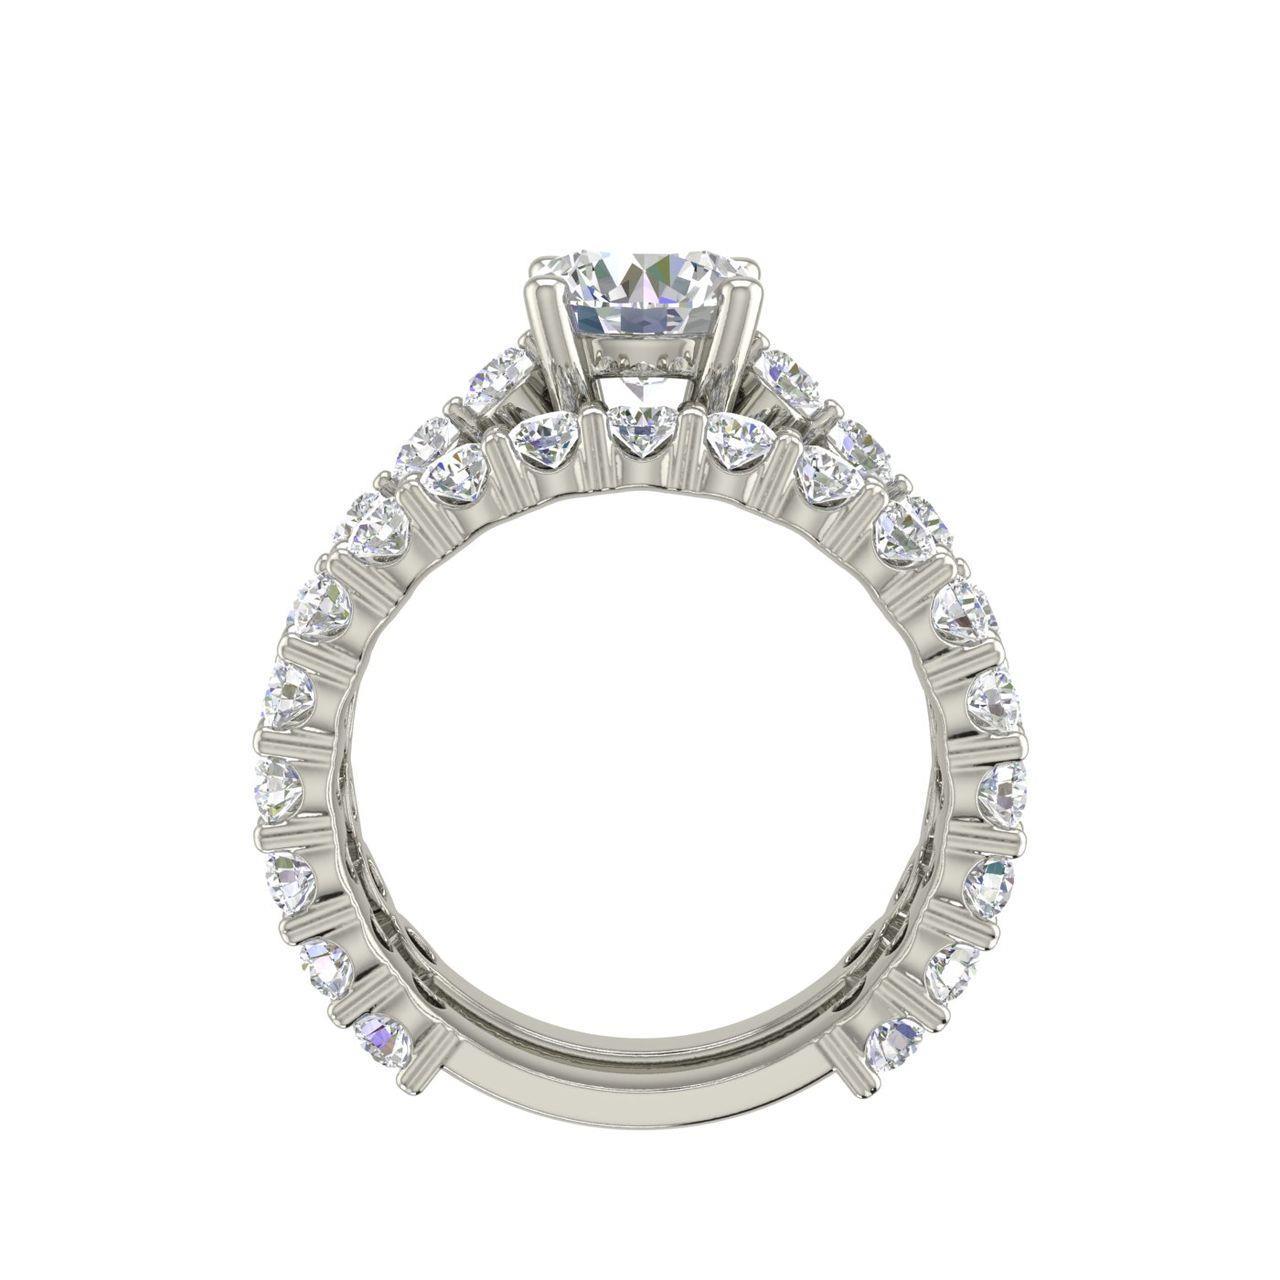 Set 2 Carat Round Cut Diamond Engagement Ring